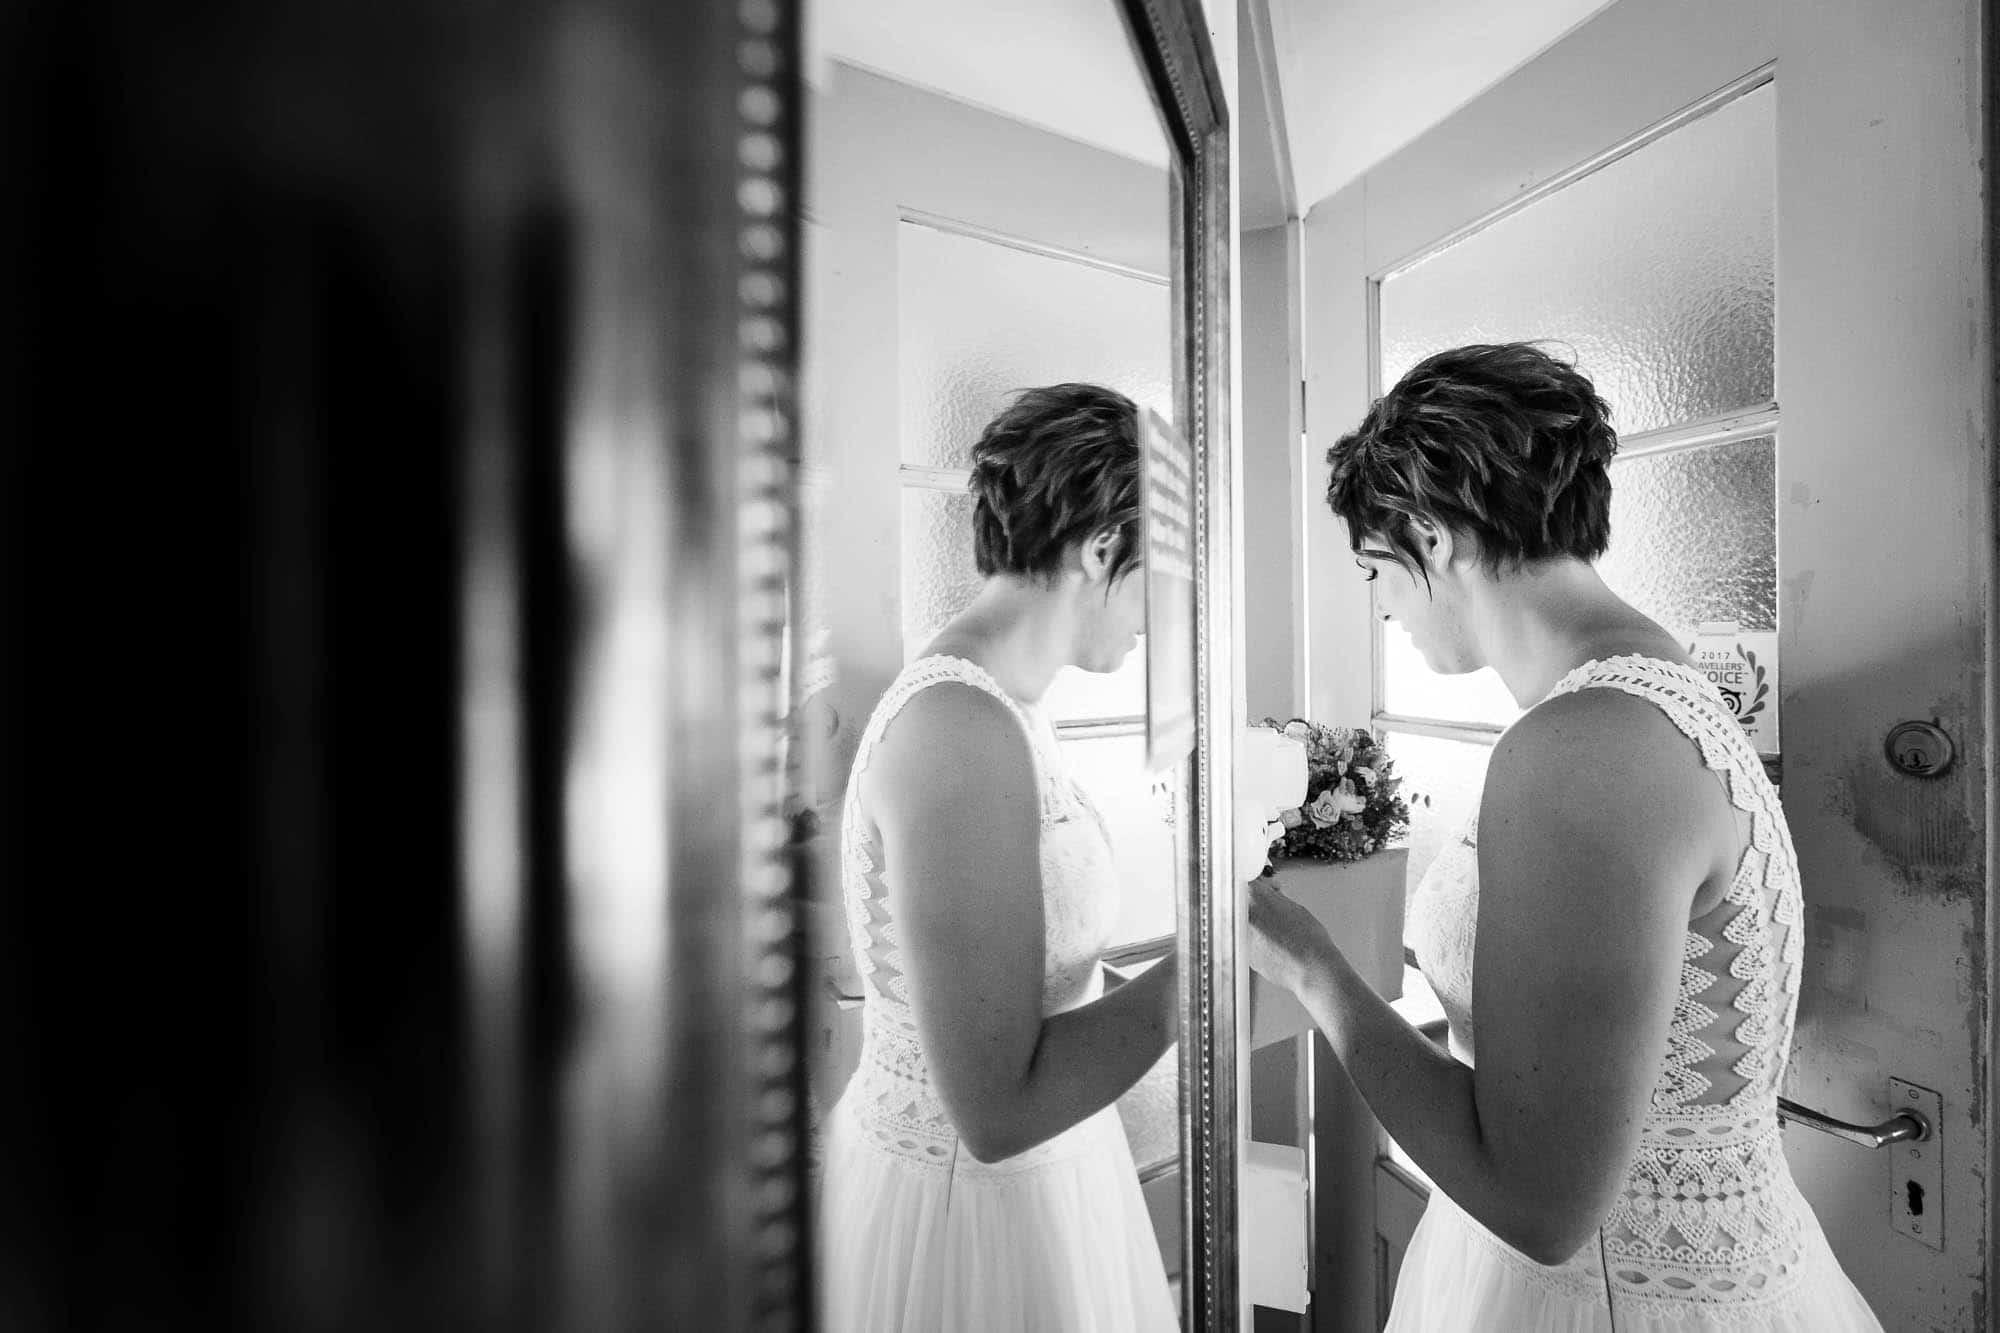 Braut nimmt Brautstrauss entgegen